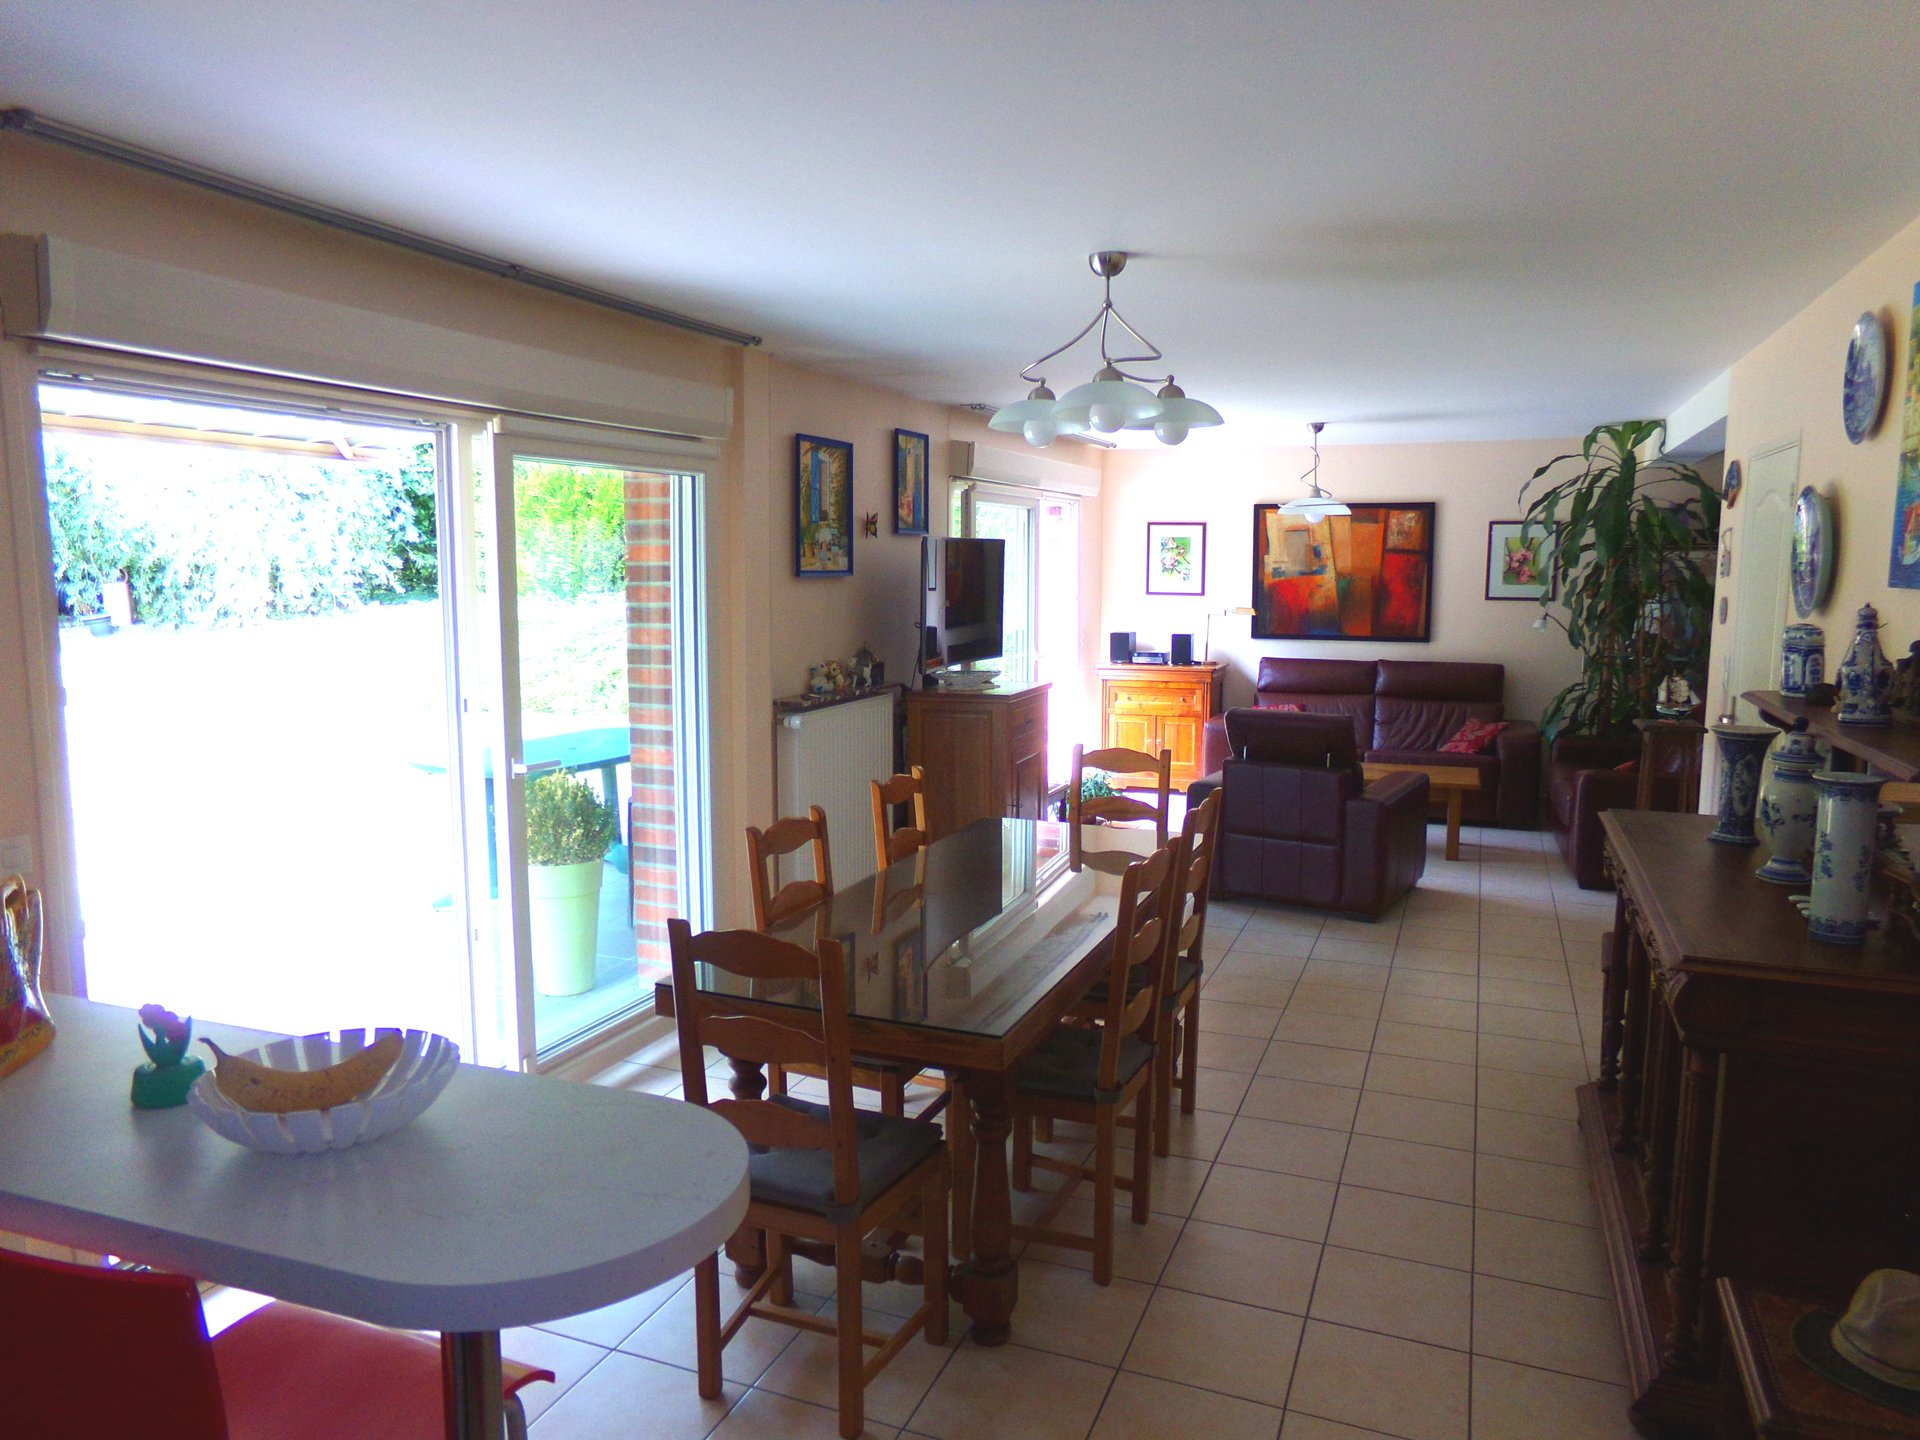 Maison Individuelle - AVESNELLES